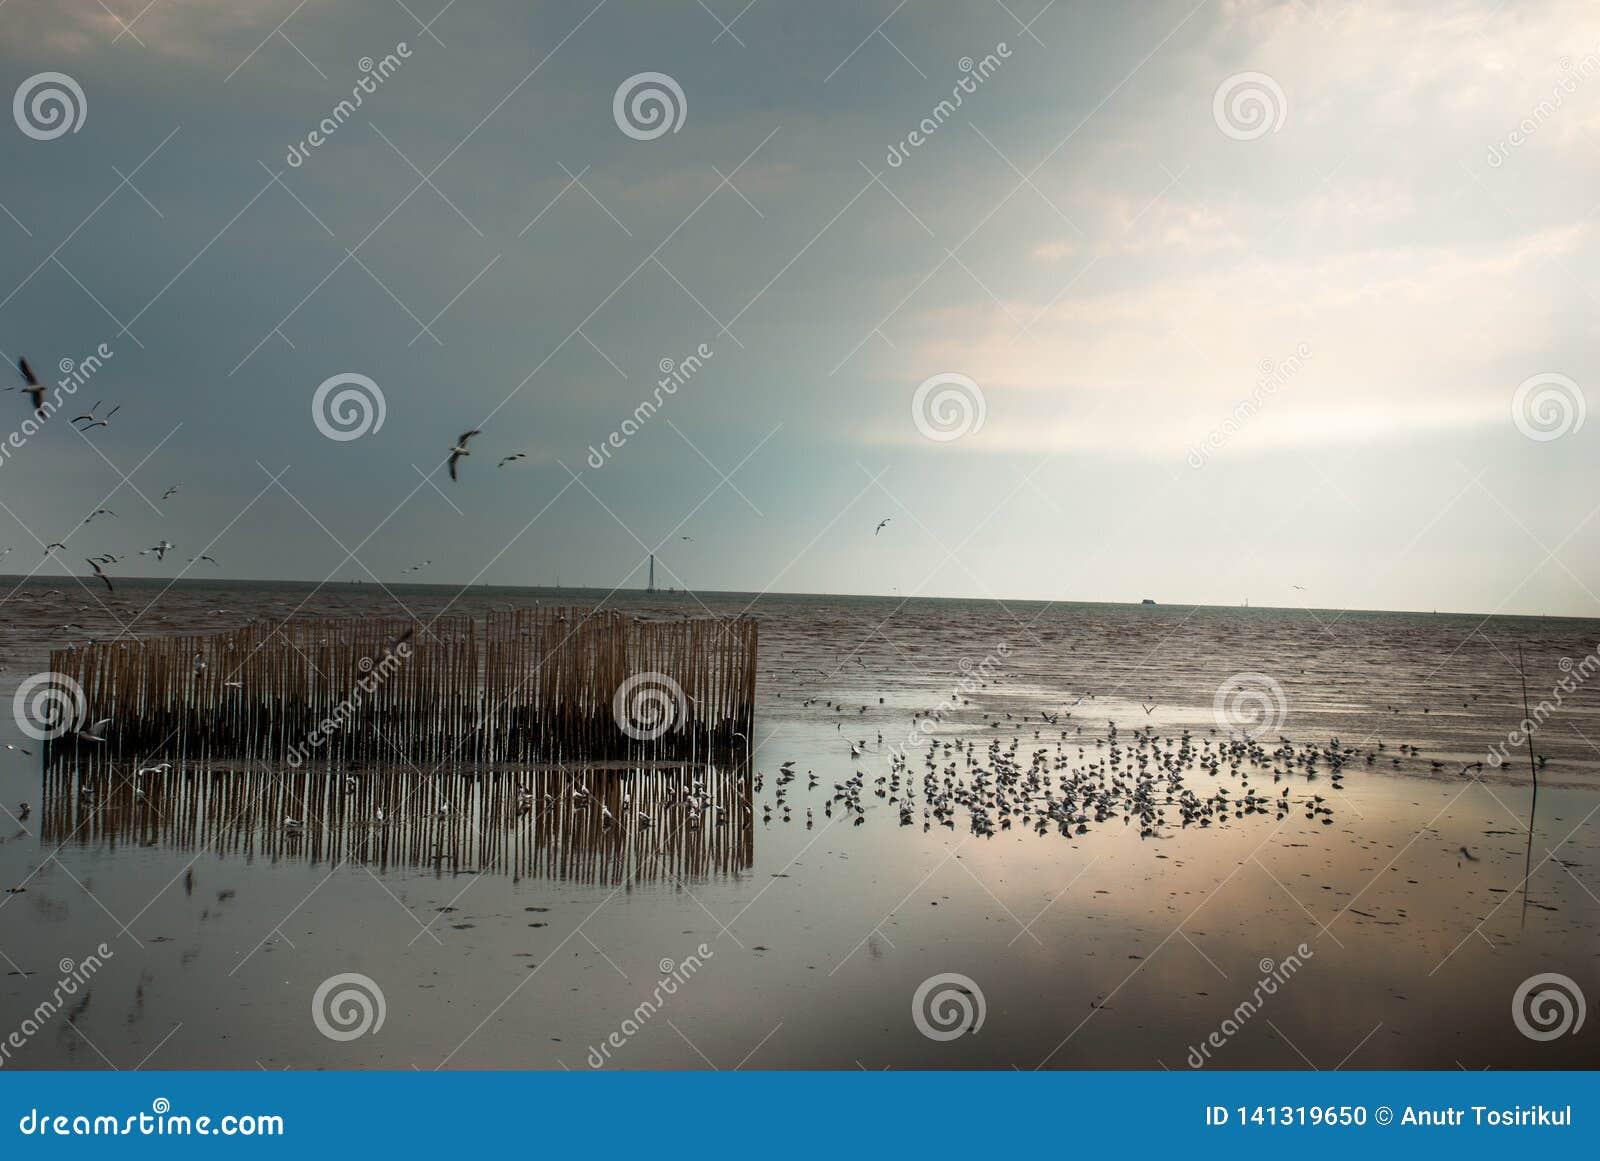 Seeseagulls†‹at†‹Bang†‹Pu